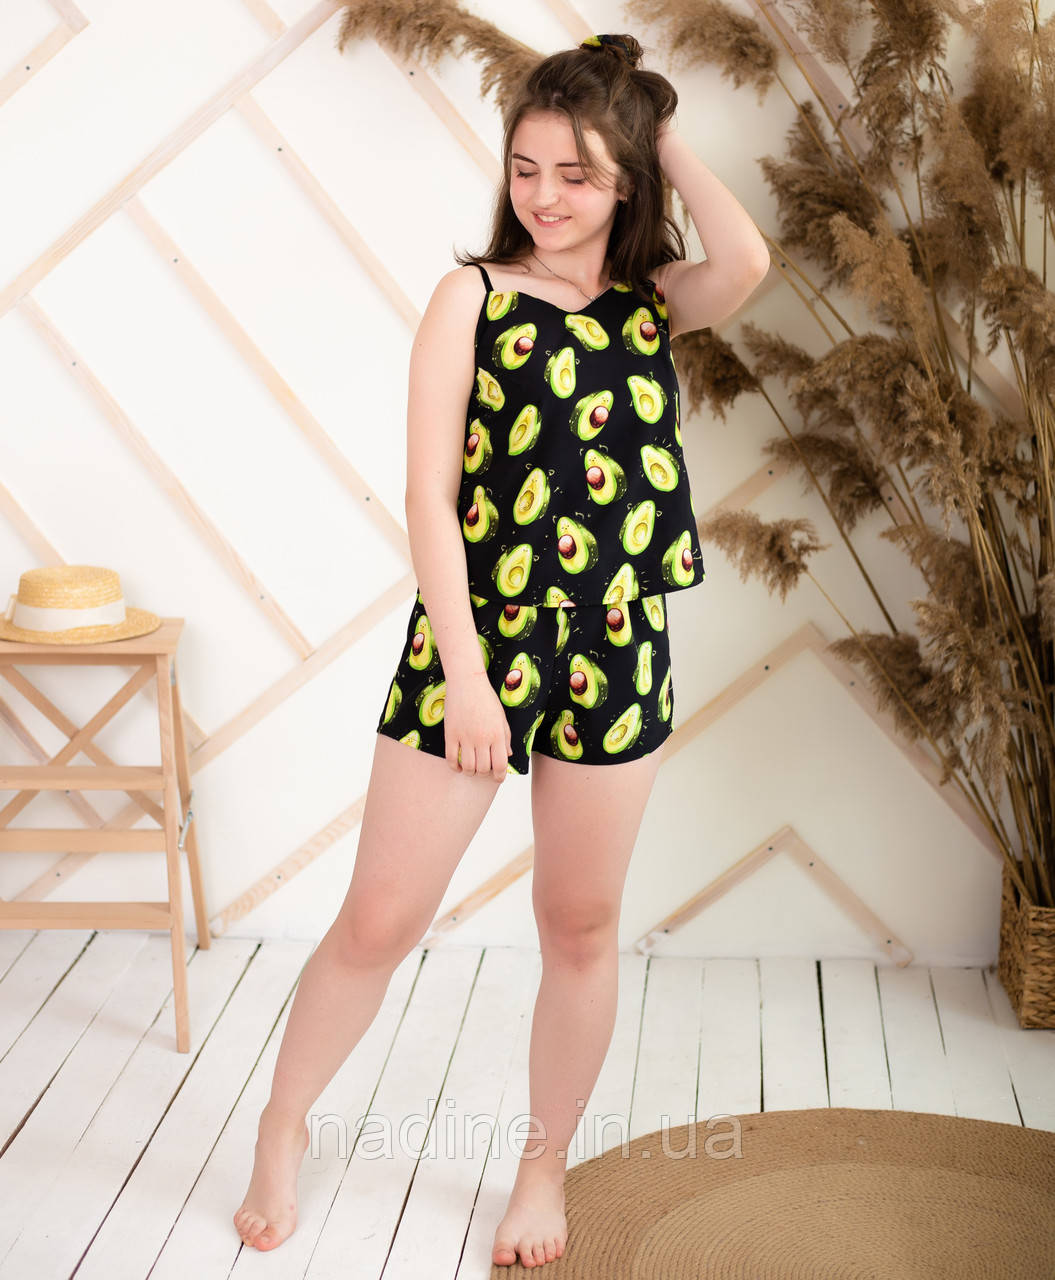 Піжама підліткова авокадо Eirena Nadine (731-70) піжама 170/44